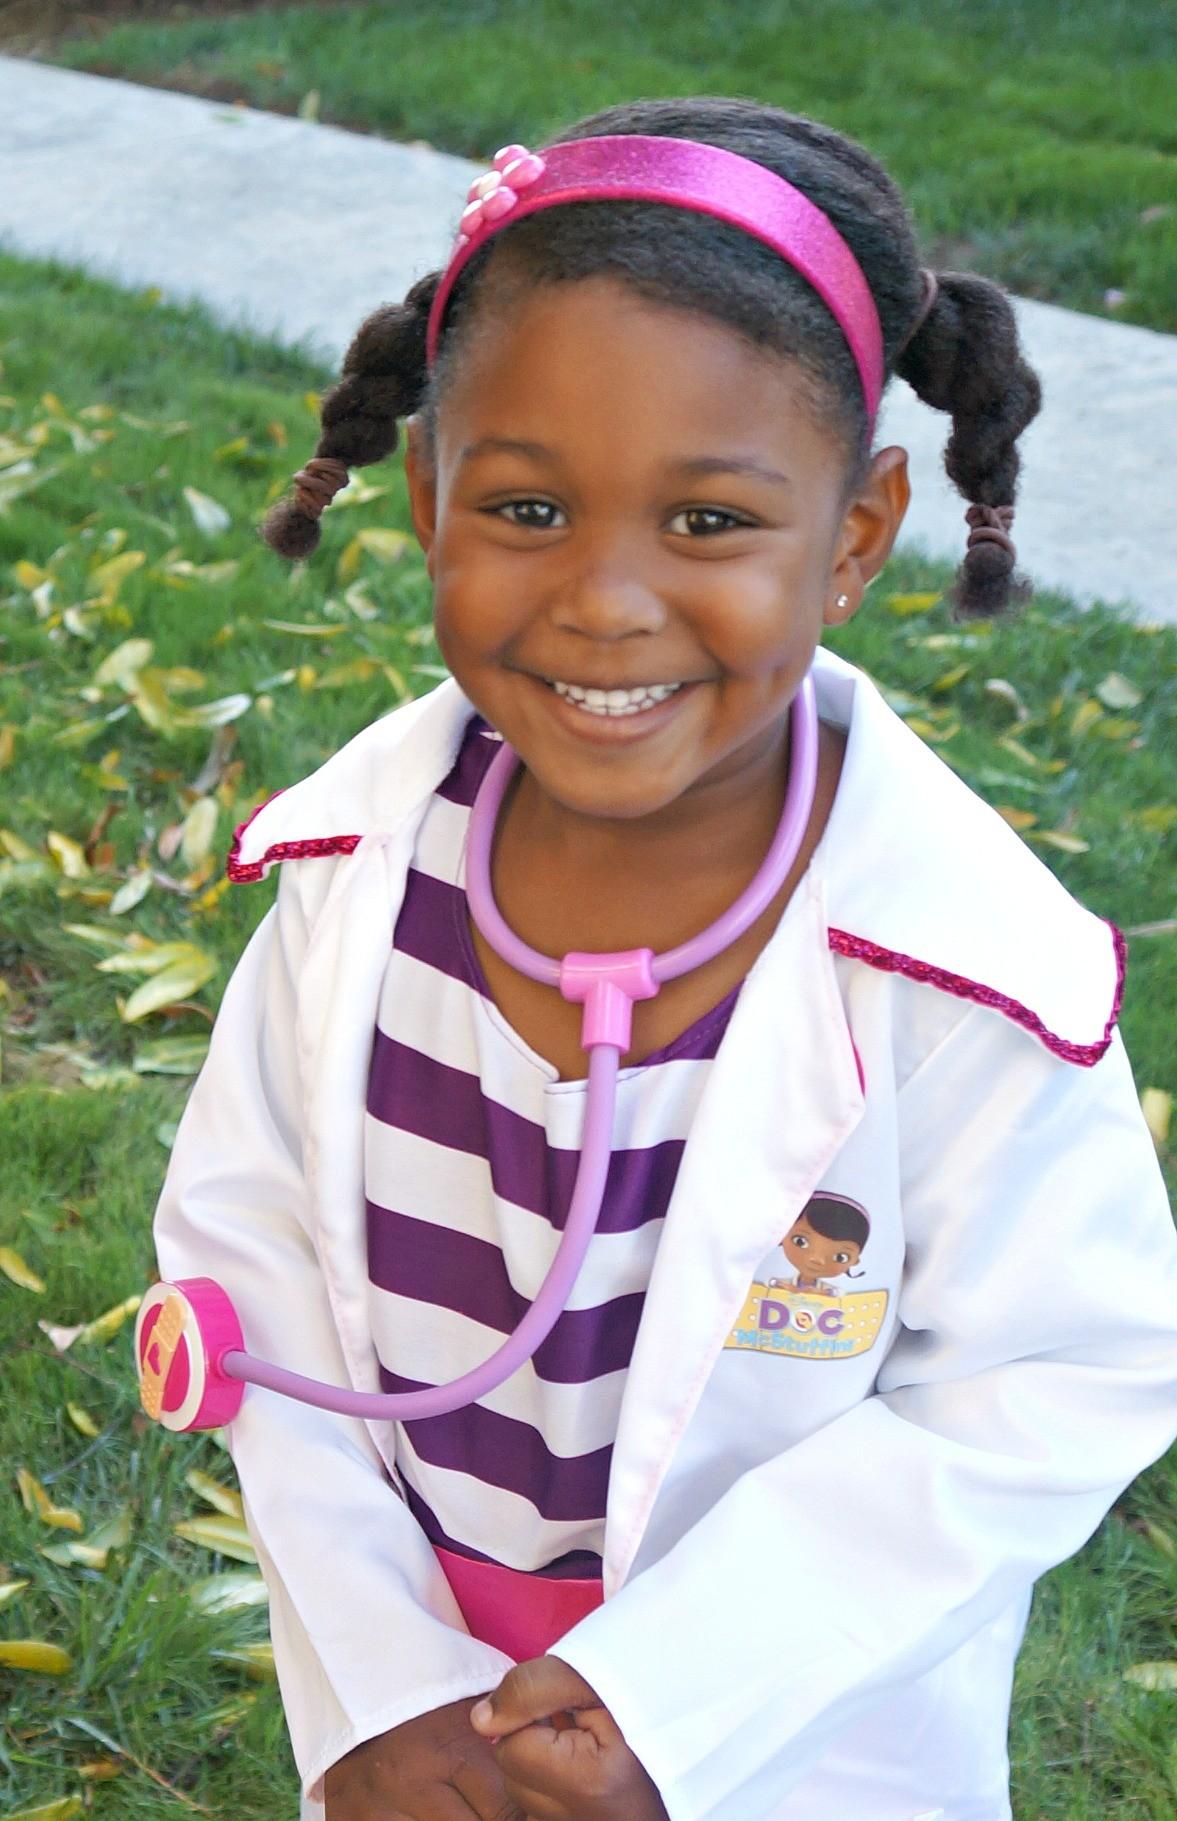 disney junior costumes at walmart cute little girl in doc mcstuffins halloween costume - Disney Jr Halloween Costumes